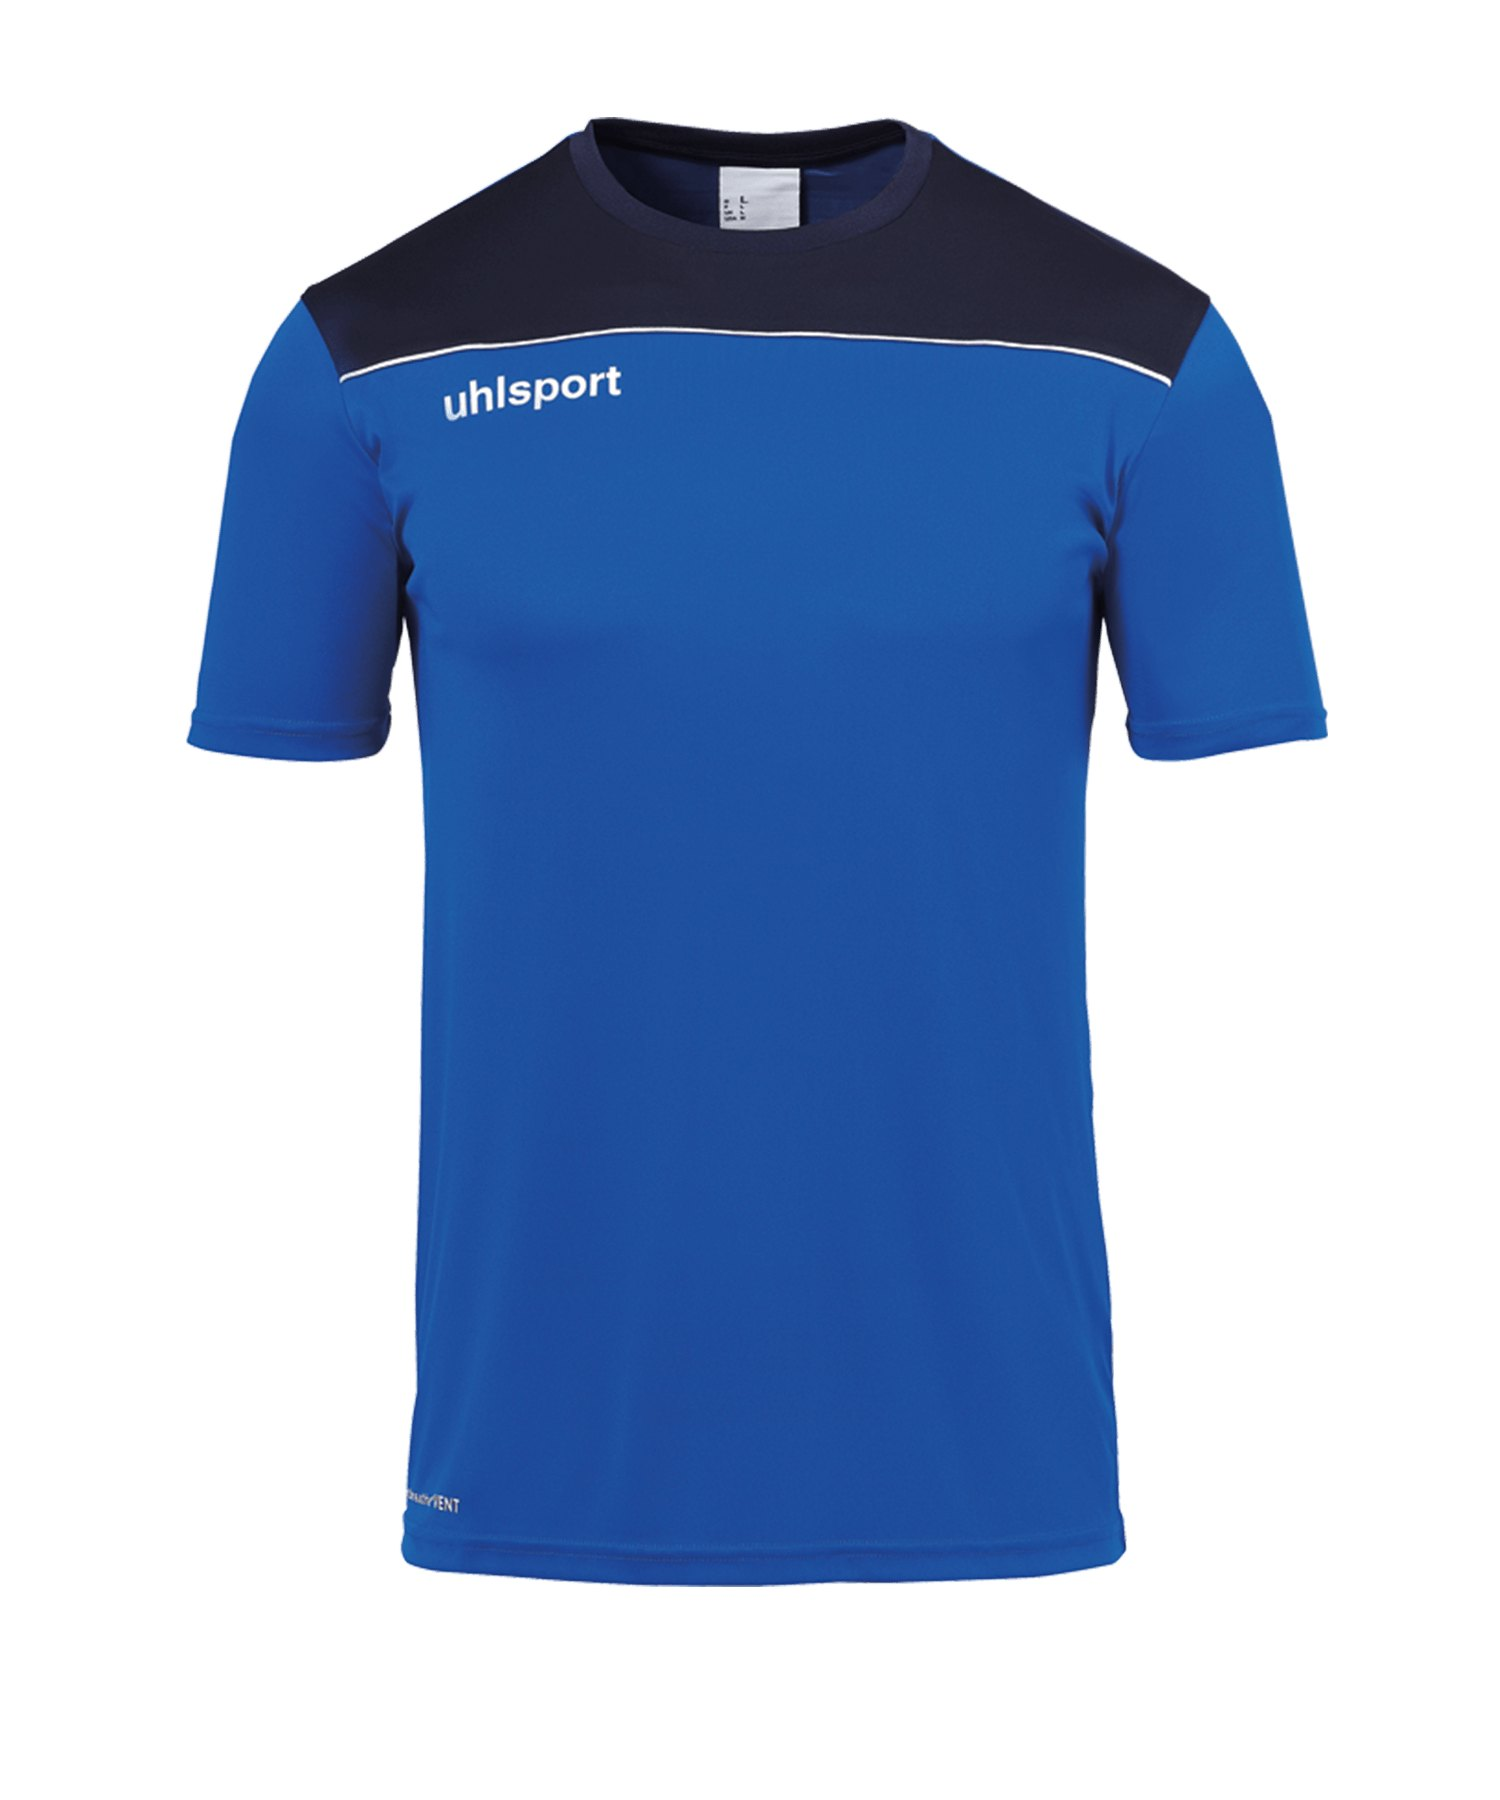 Uhlsport Offense 23 Trainingsshirt Blau F03 - blau